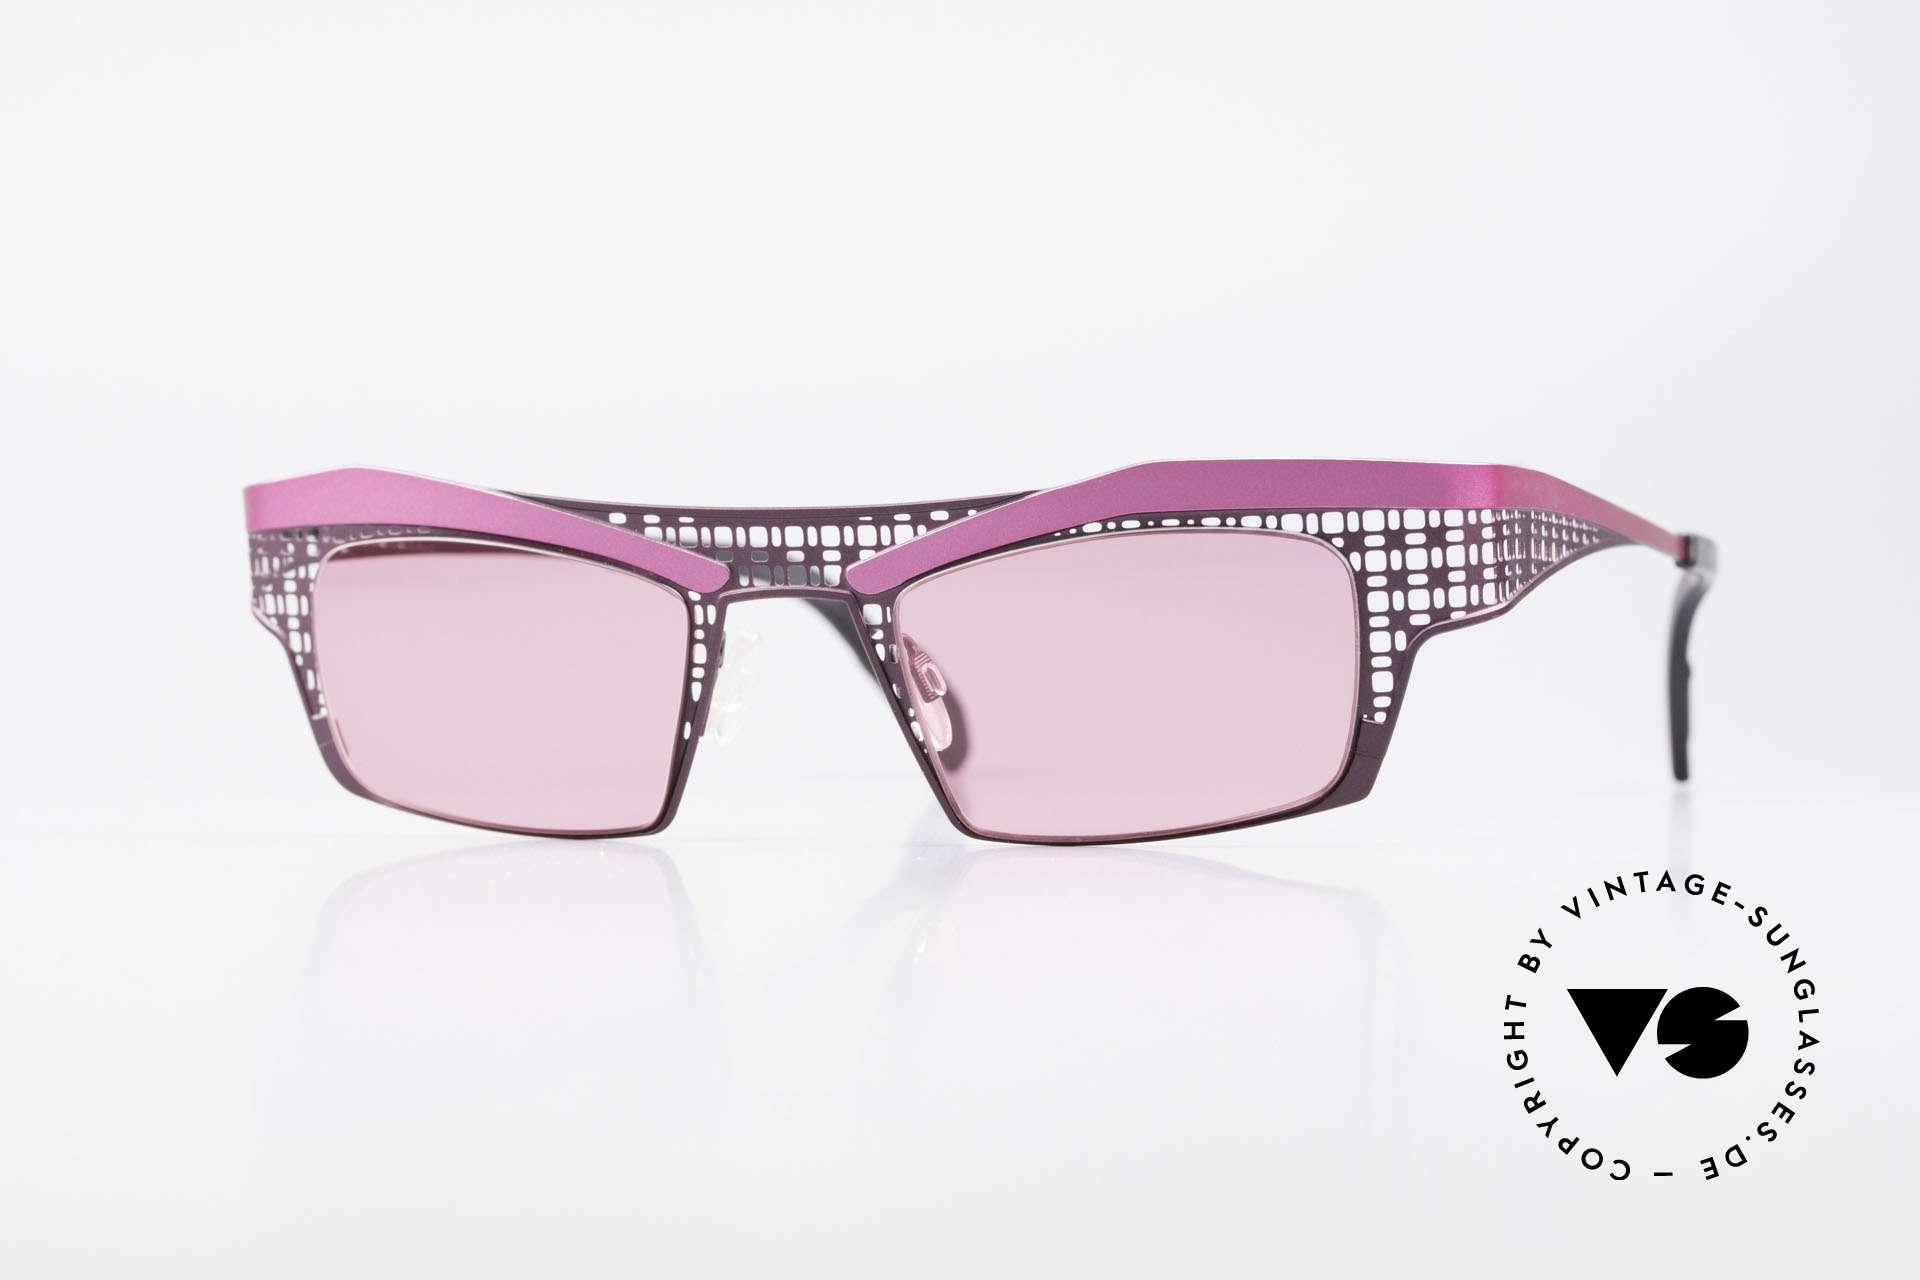 Theo Belgium Eye-Witness TA Avant-Garde Sunglasses Pink, Theo Belgium: the most self-willed brand in the world, Made for Women